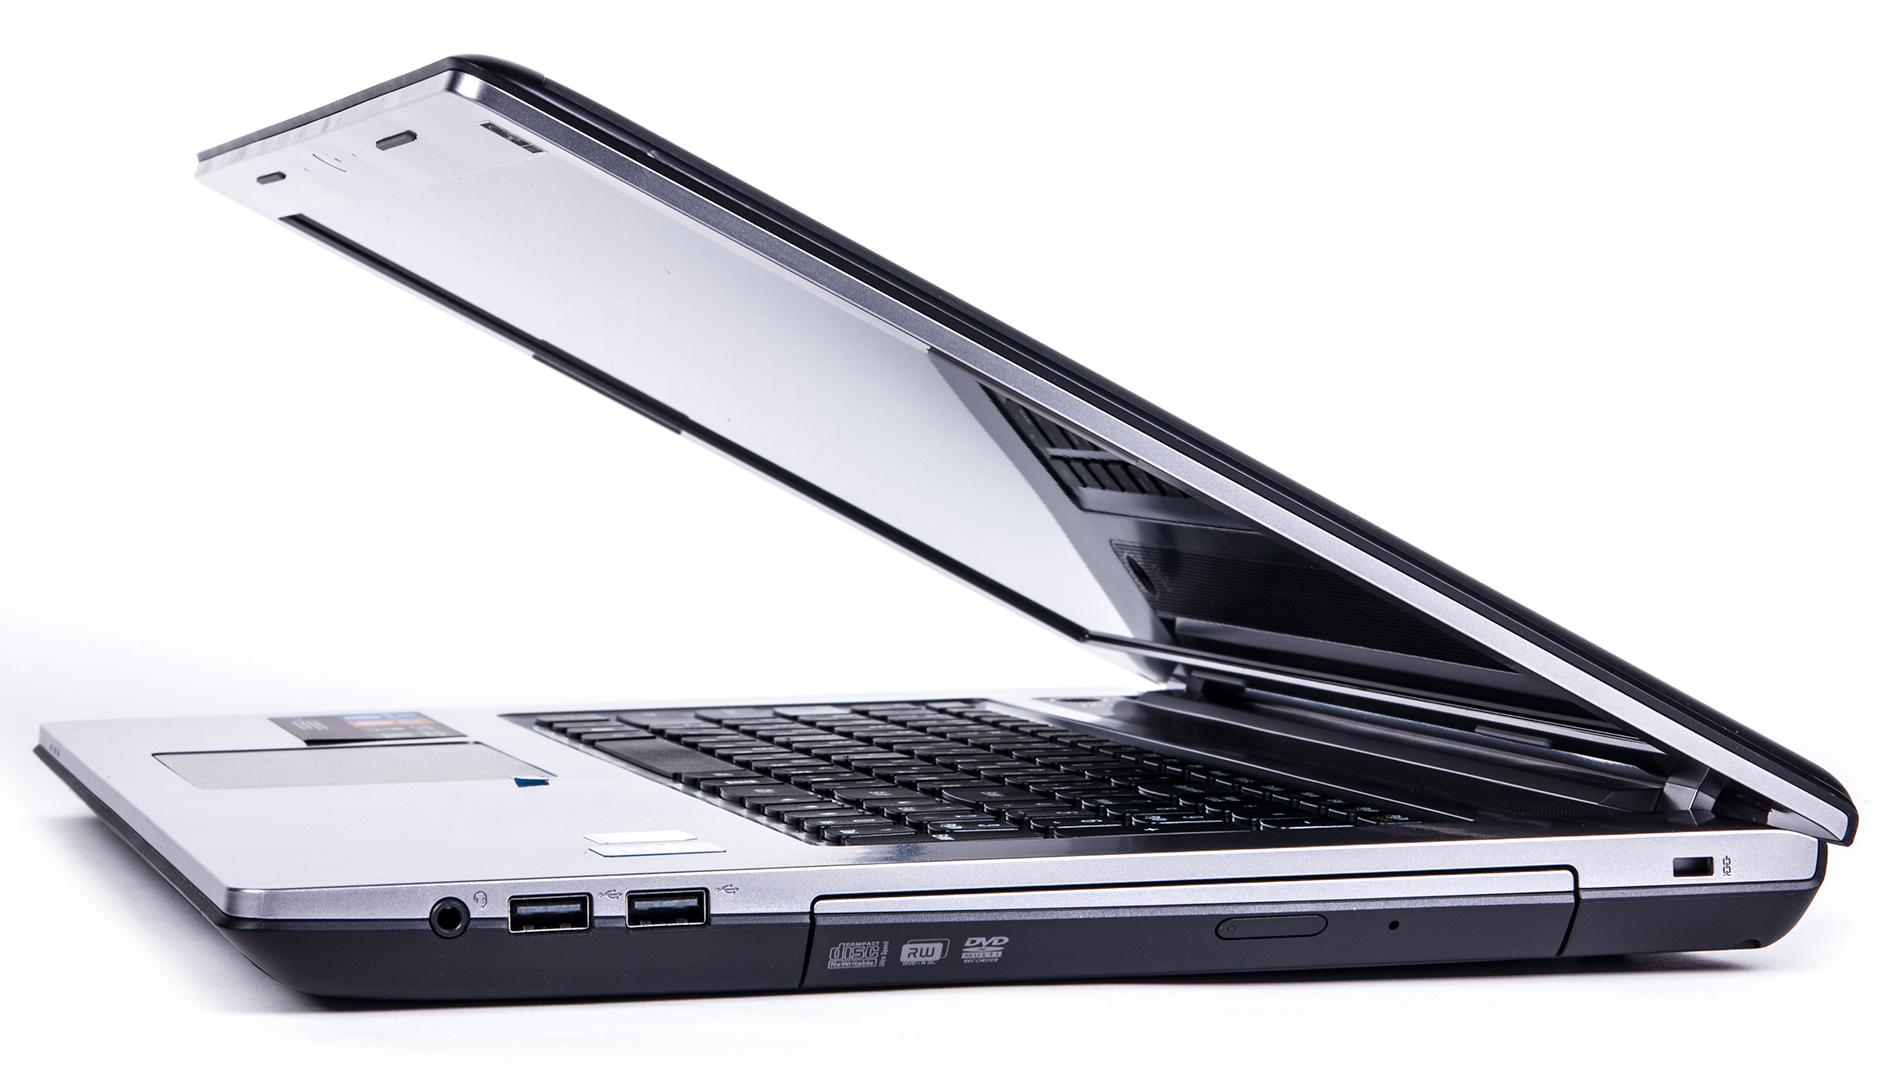 Lenovo IdeaPad Z710 Qualcomm WLAN Drivers PC